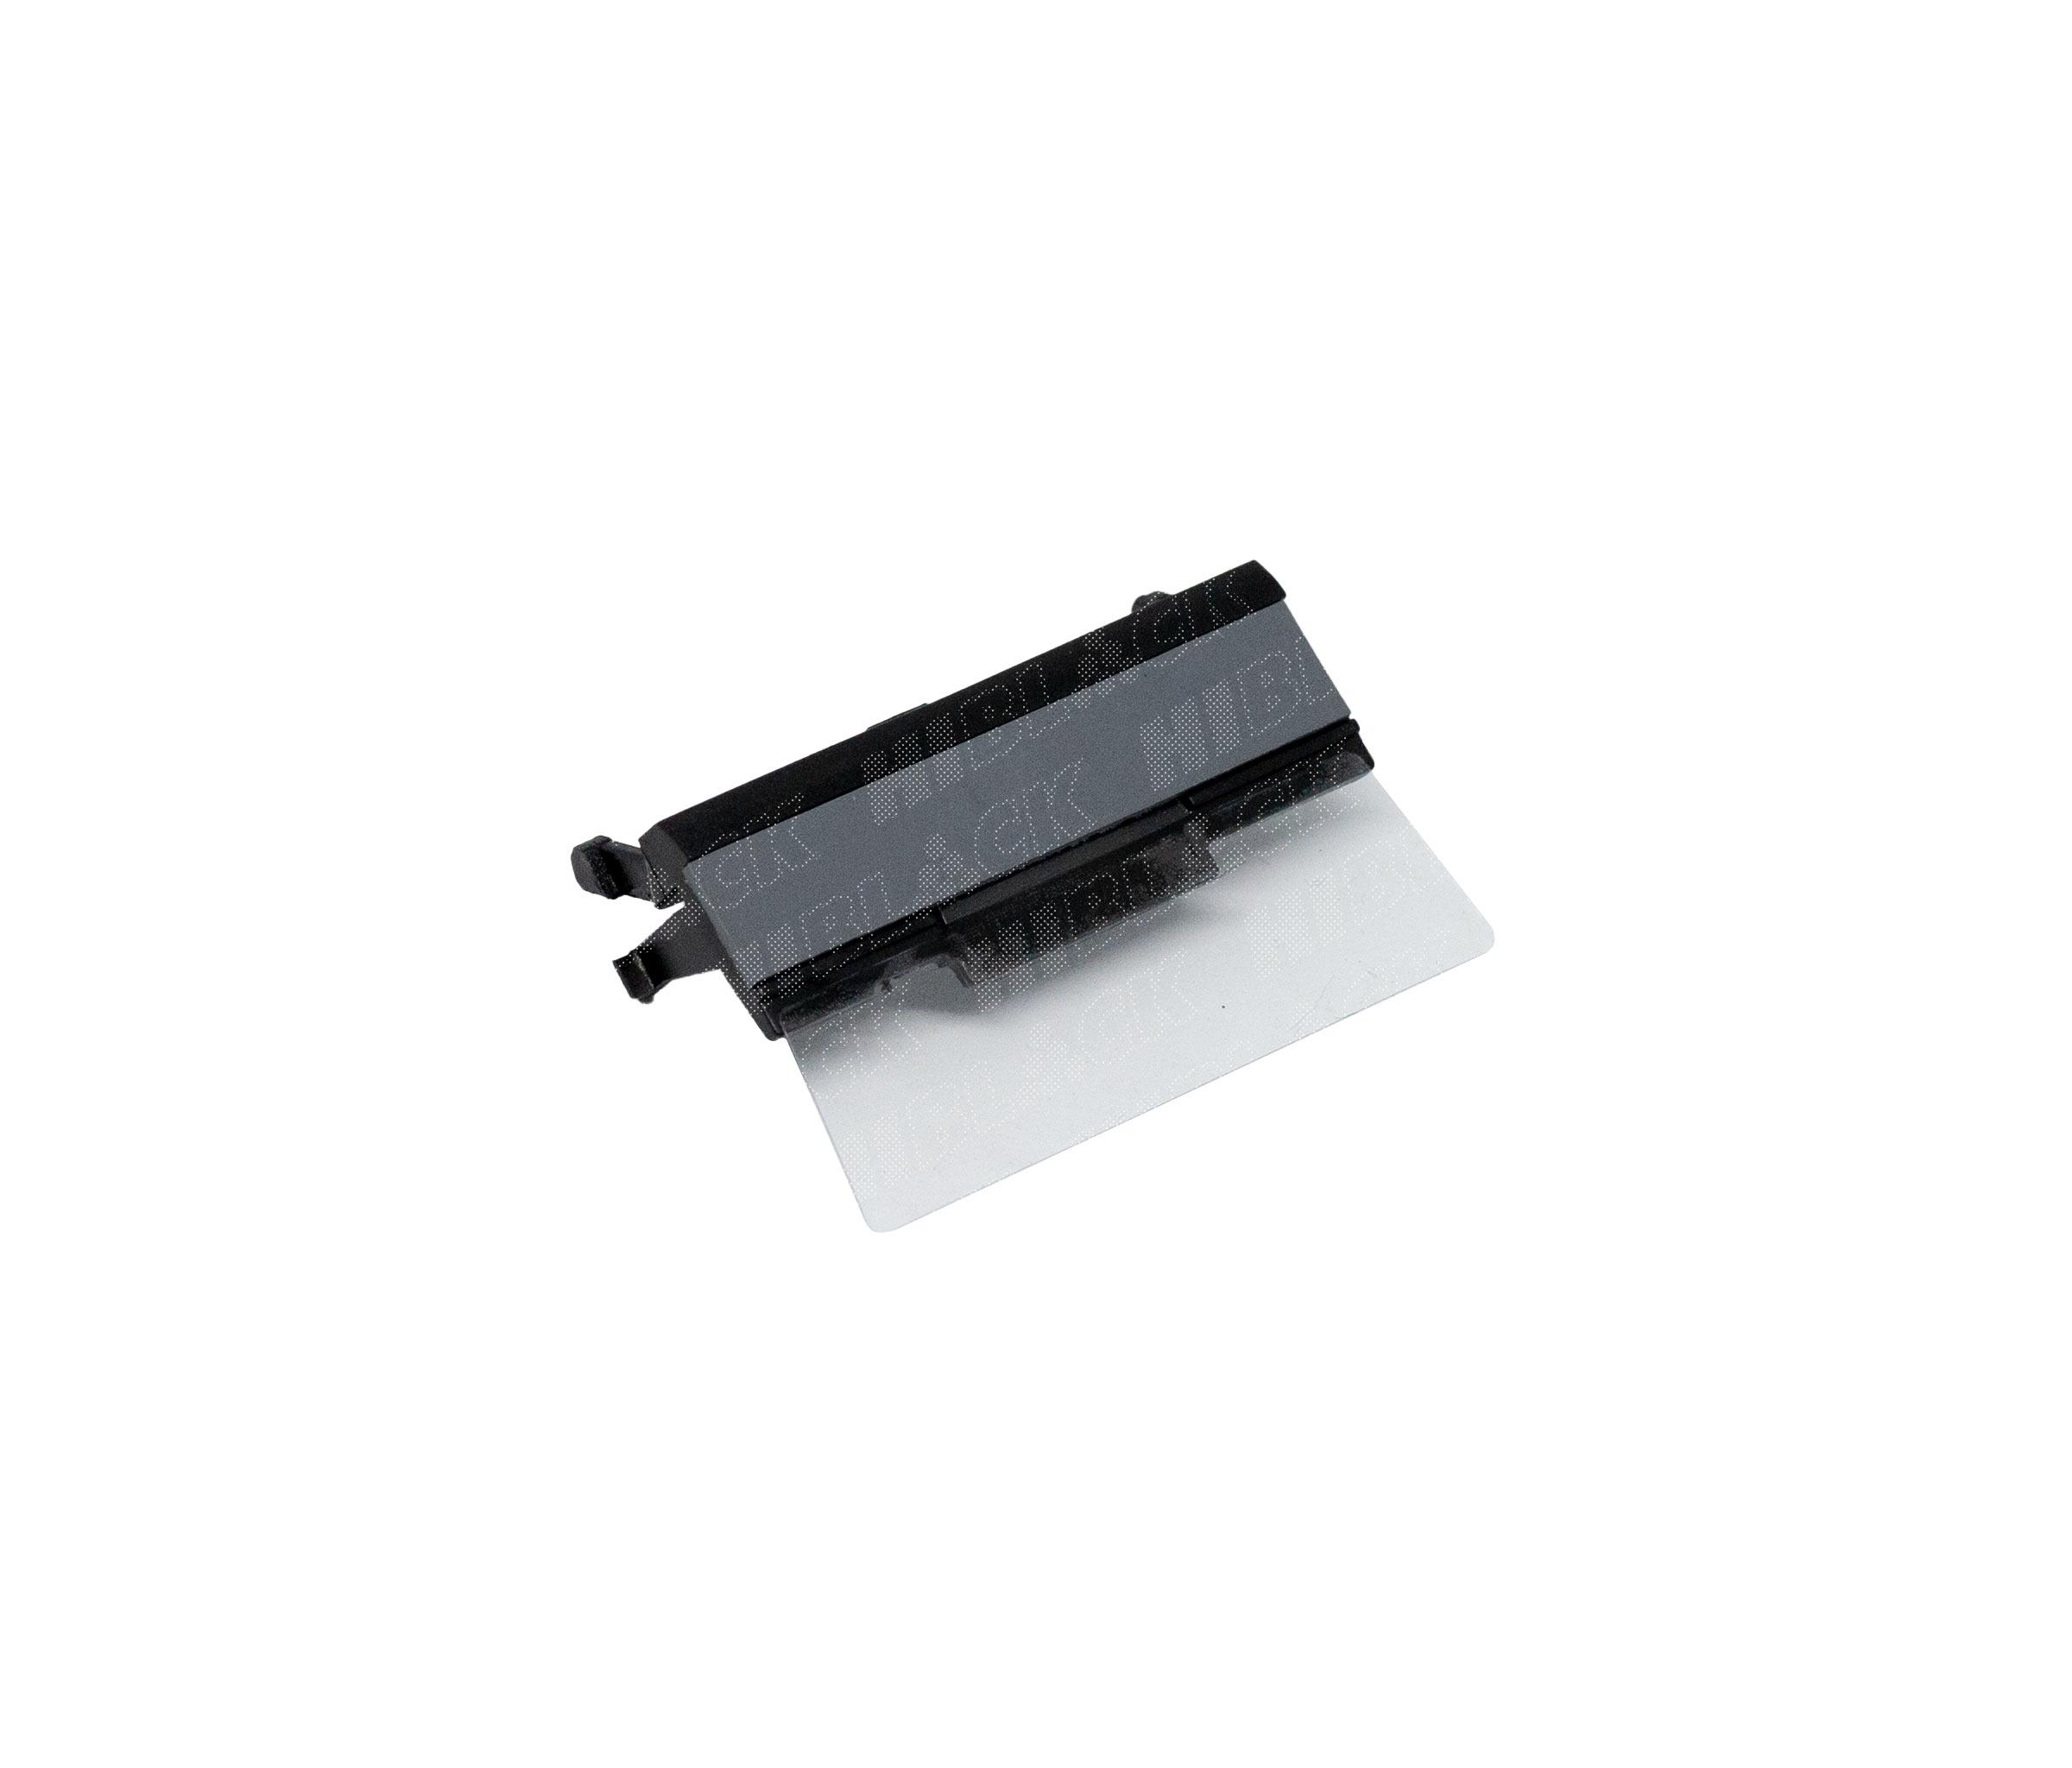 Тормозная площадка для Samsung ML-2855/2850/Ph3250/WC3210 (совм)